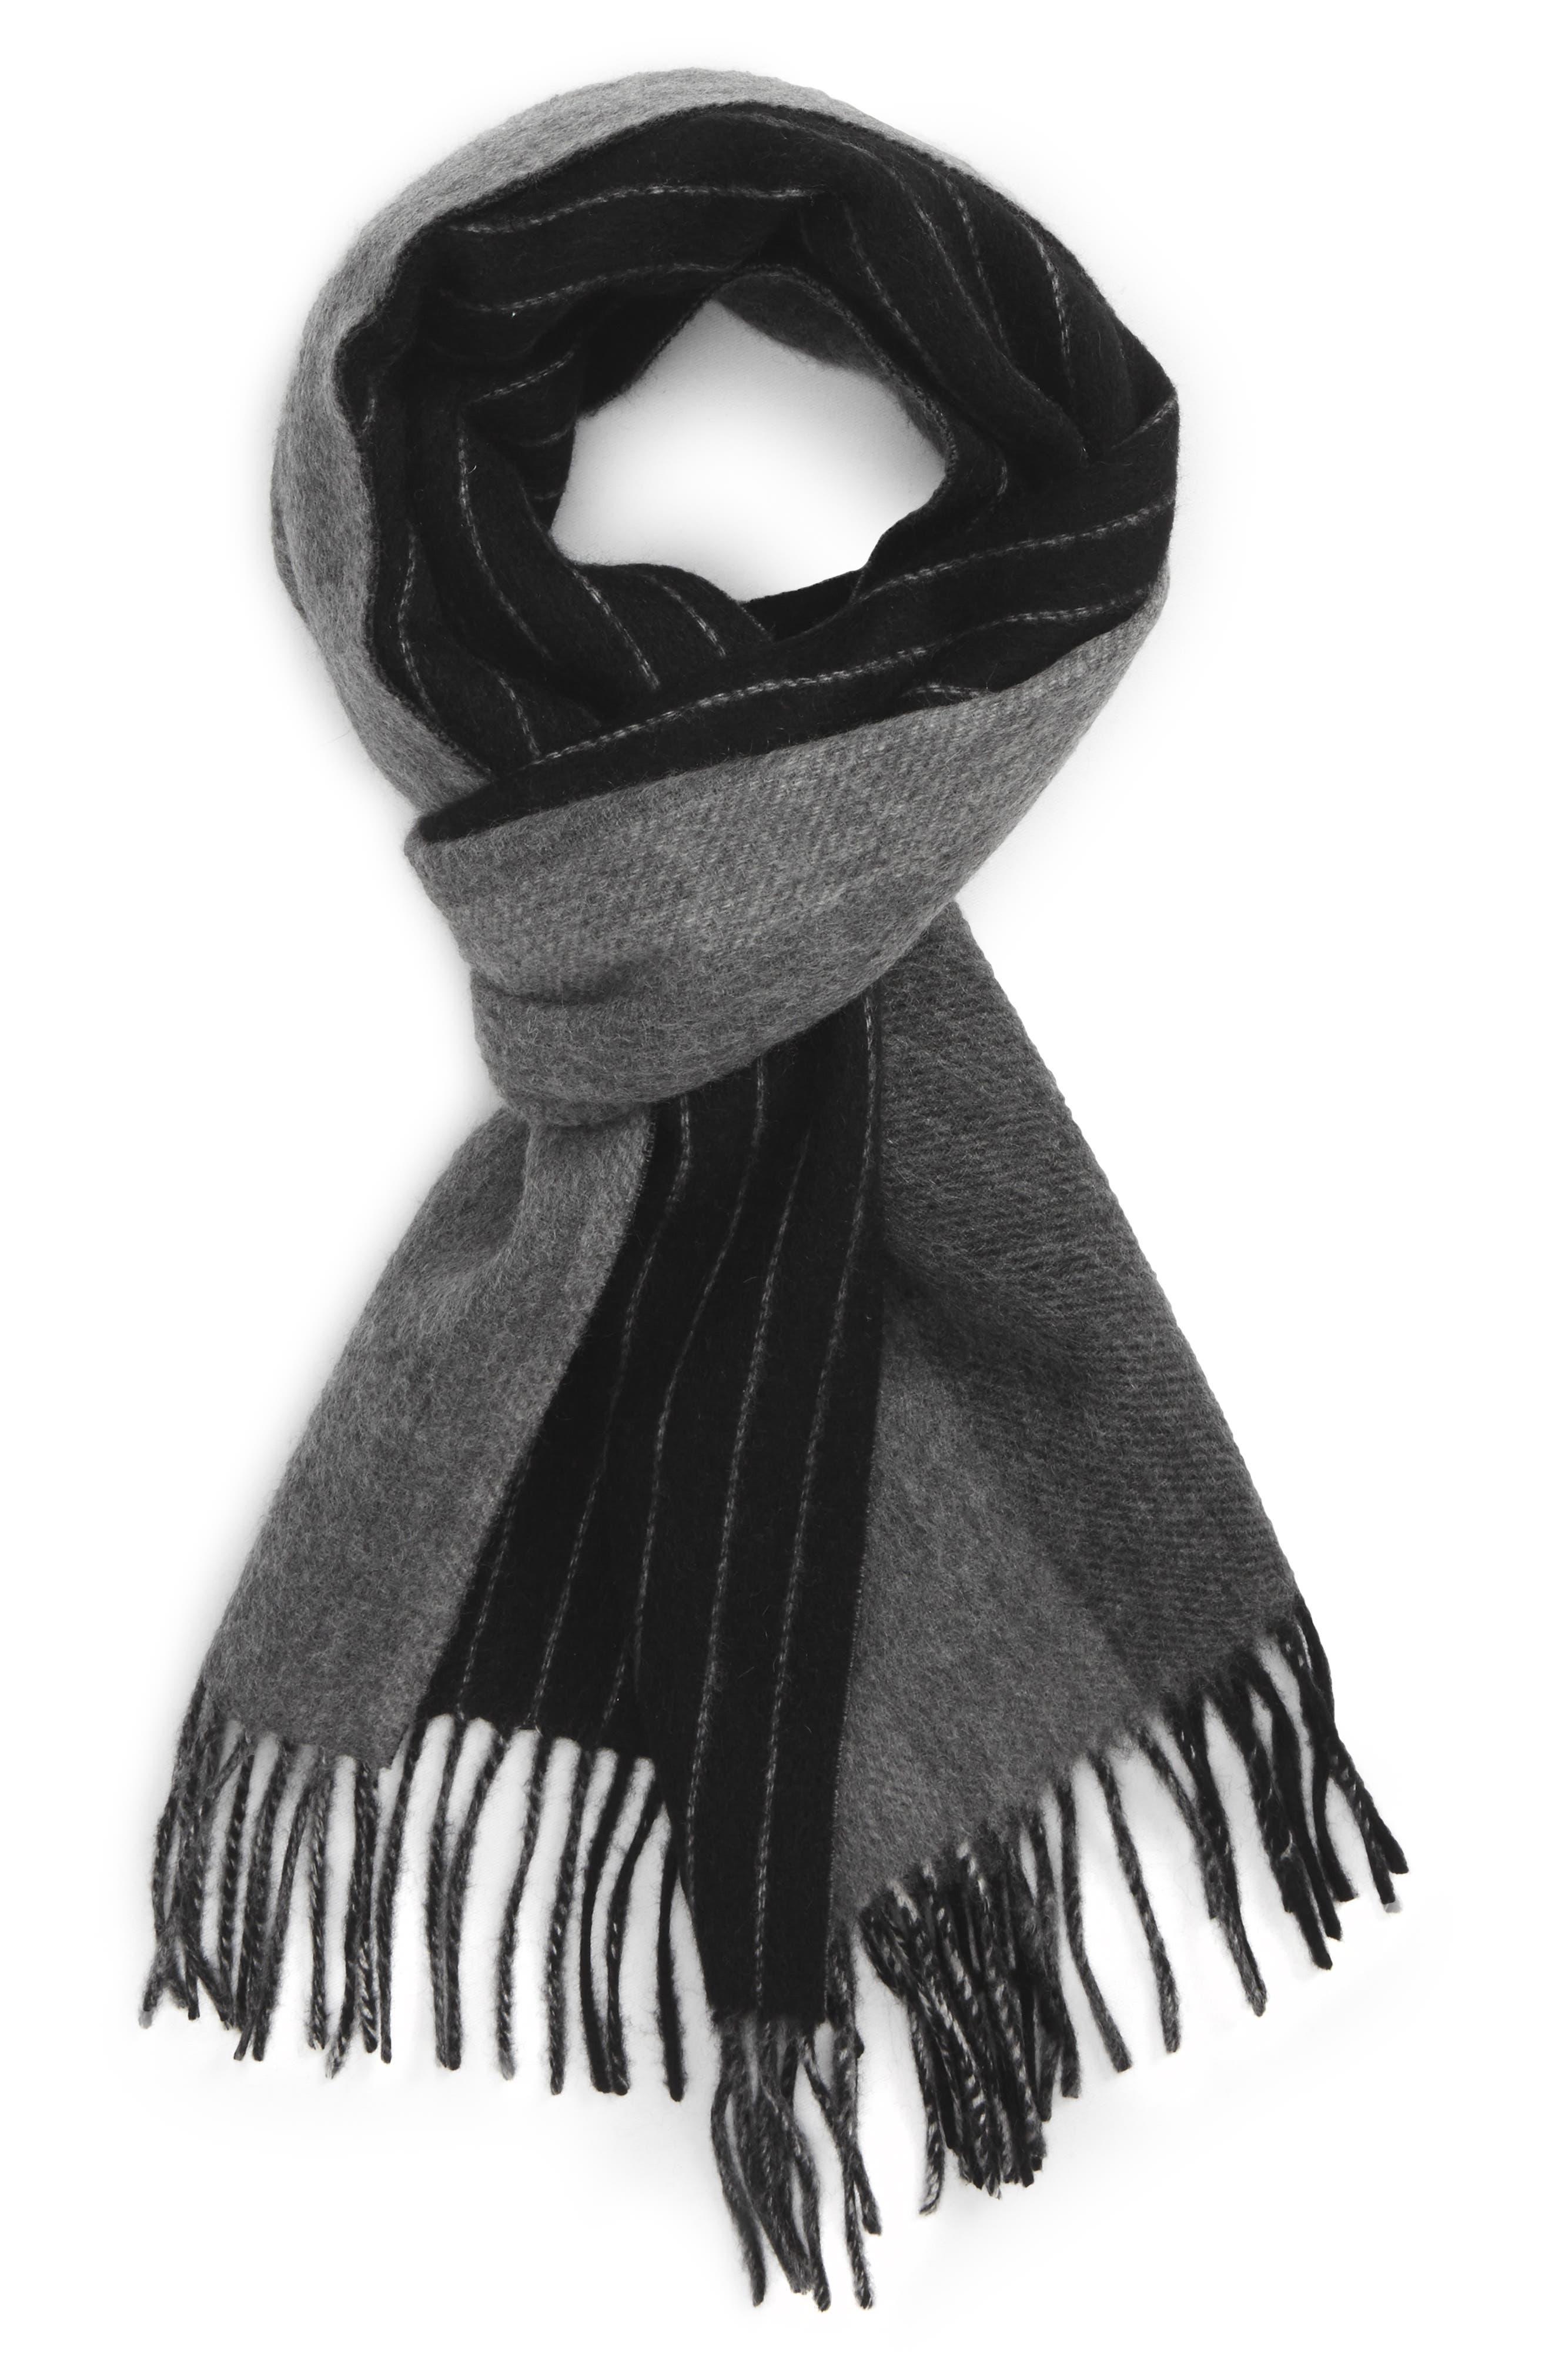 Pinstripe Cashmere Scarf,                             Main thumbnail 1, color,                             Black/ Grey